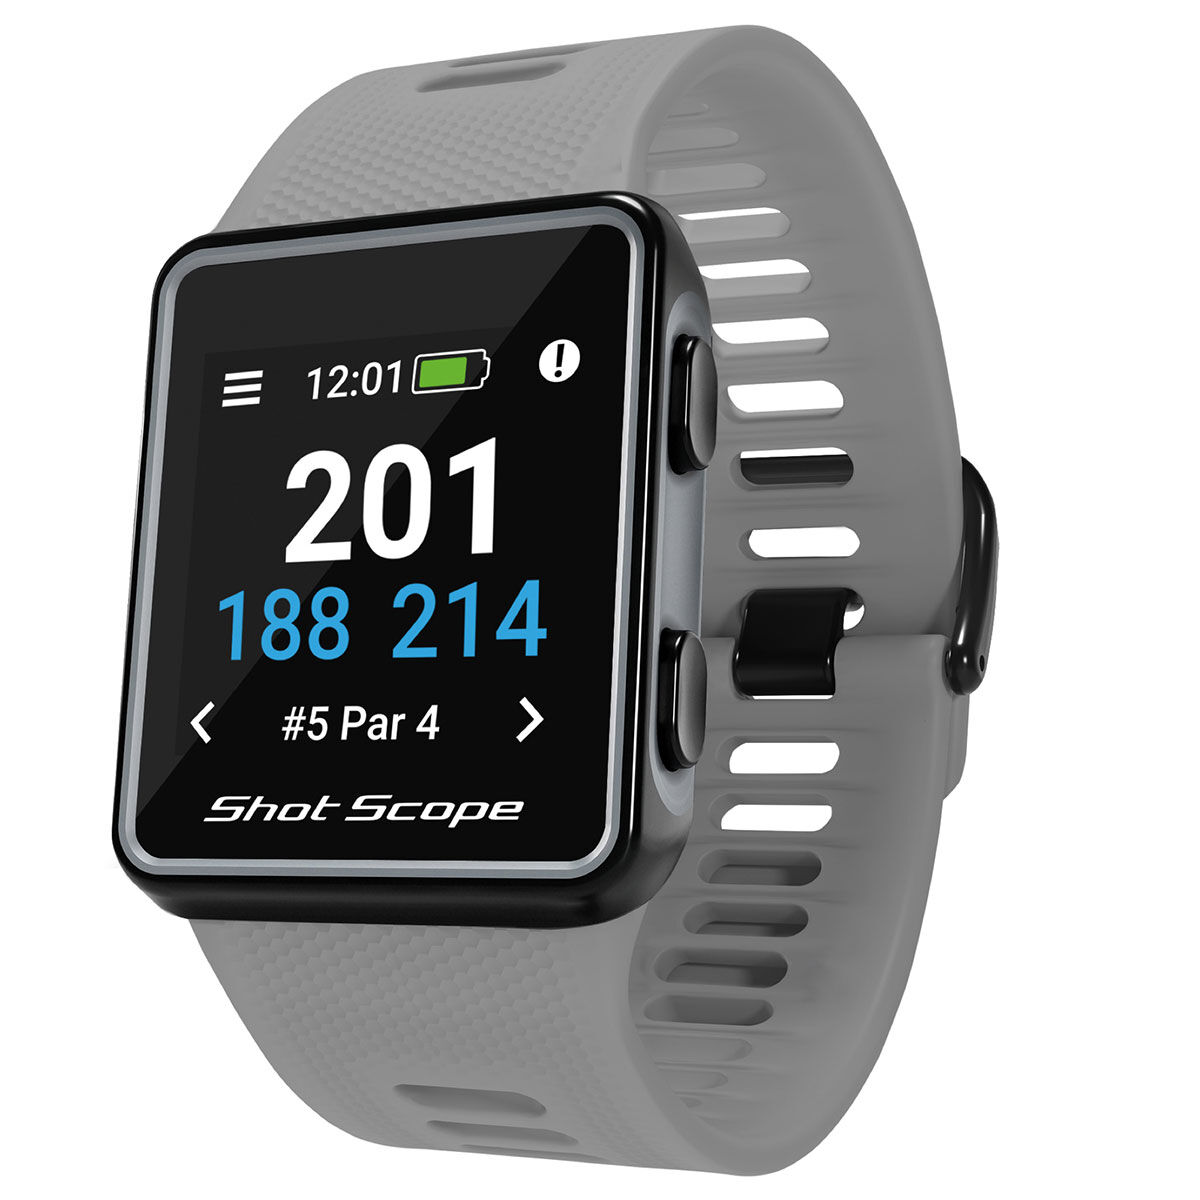 Shot Scope G3 Golf GPS Watch, Male, Grey   American Golf